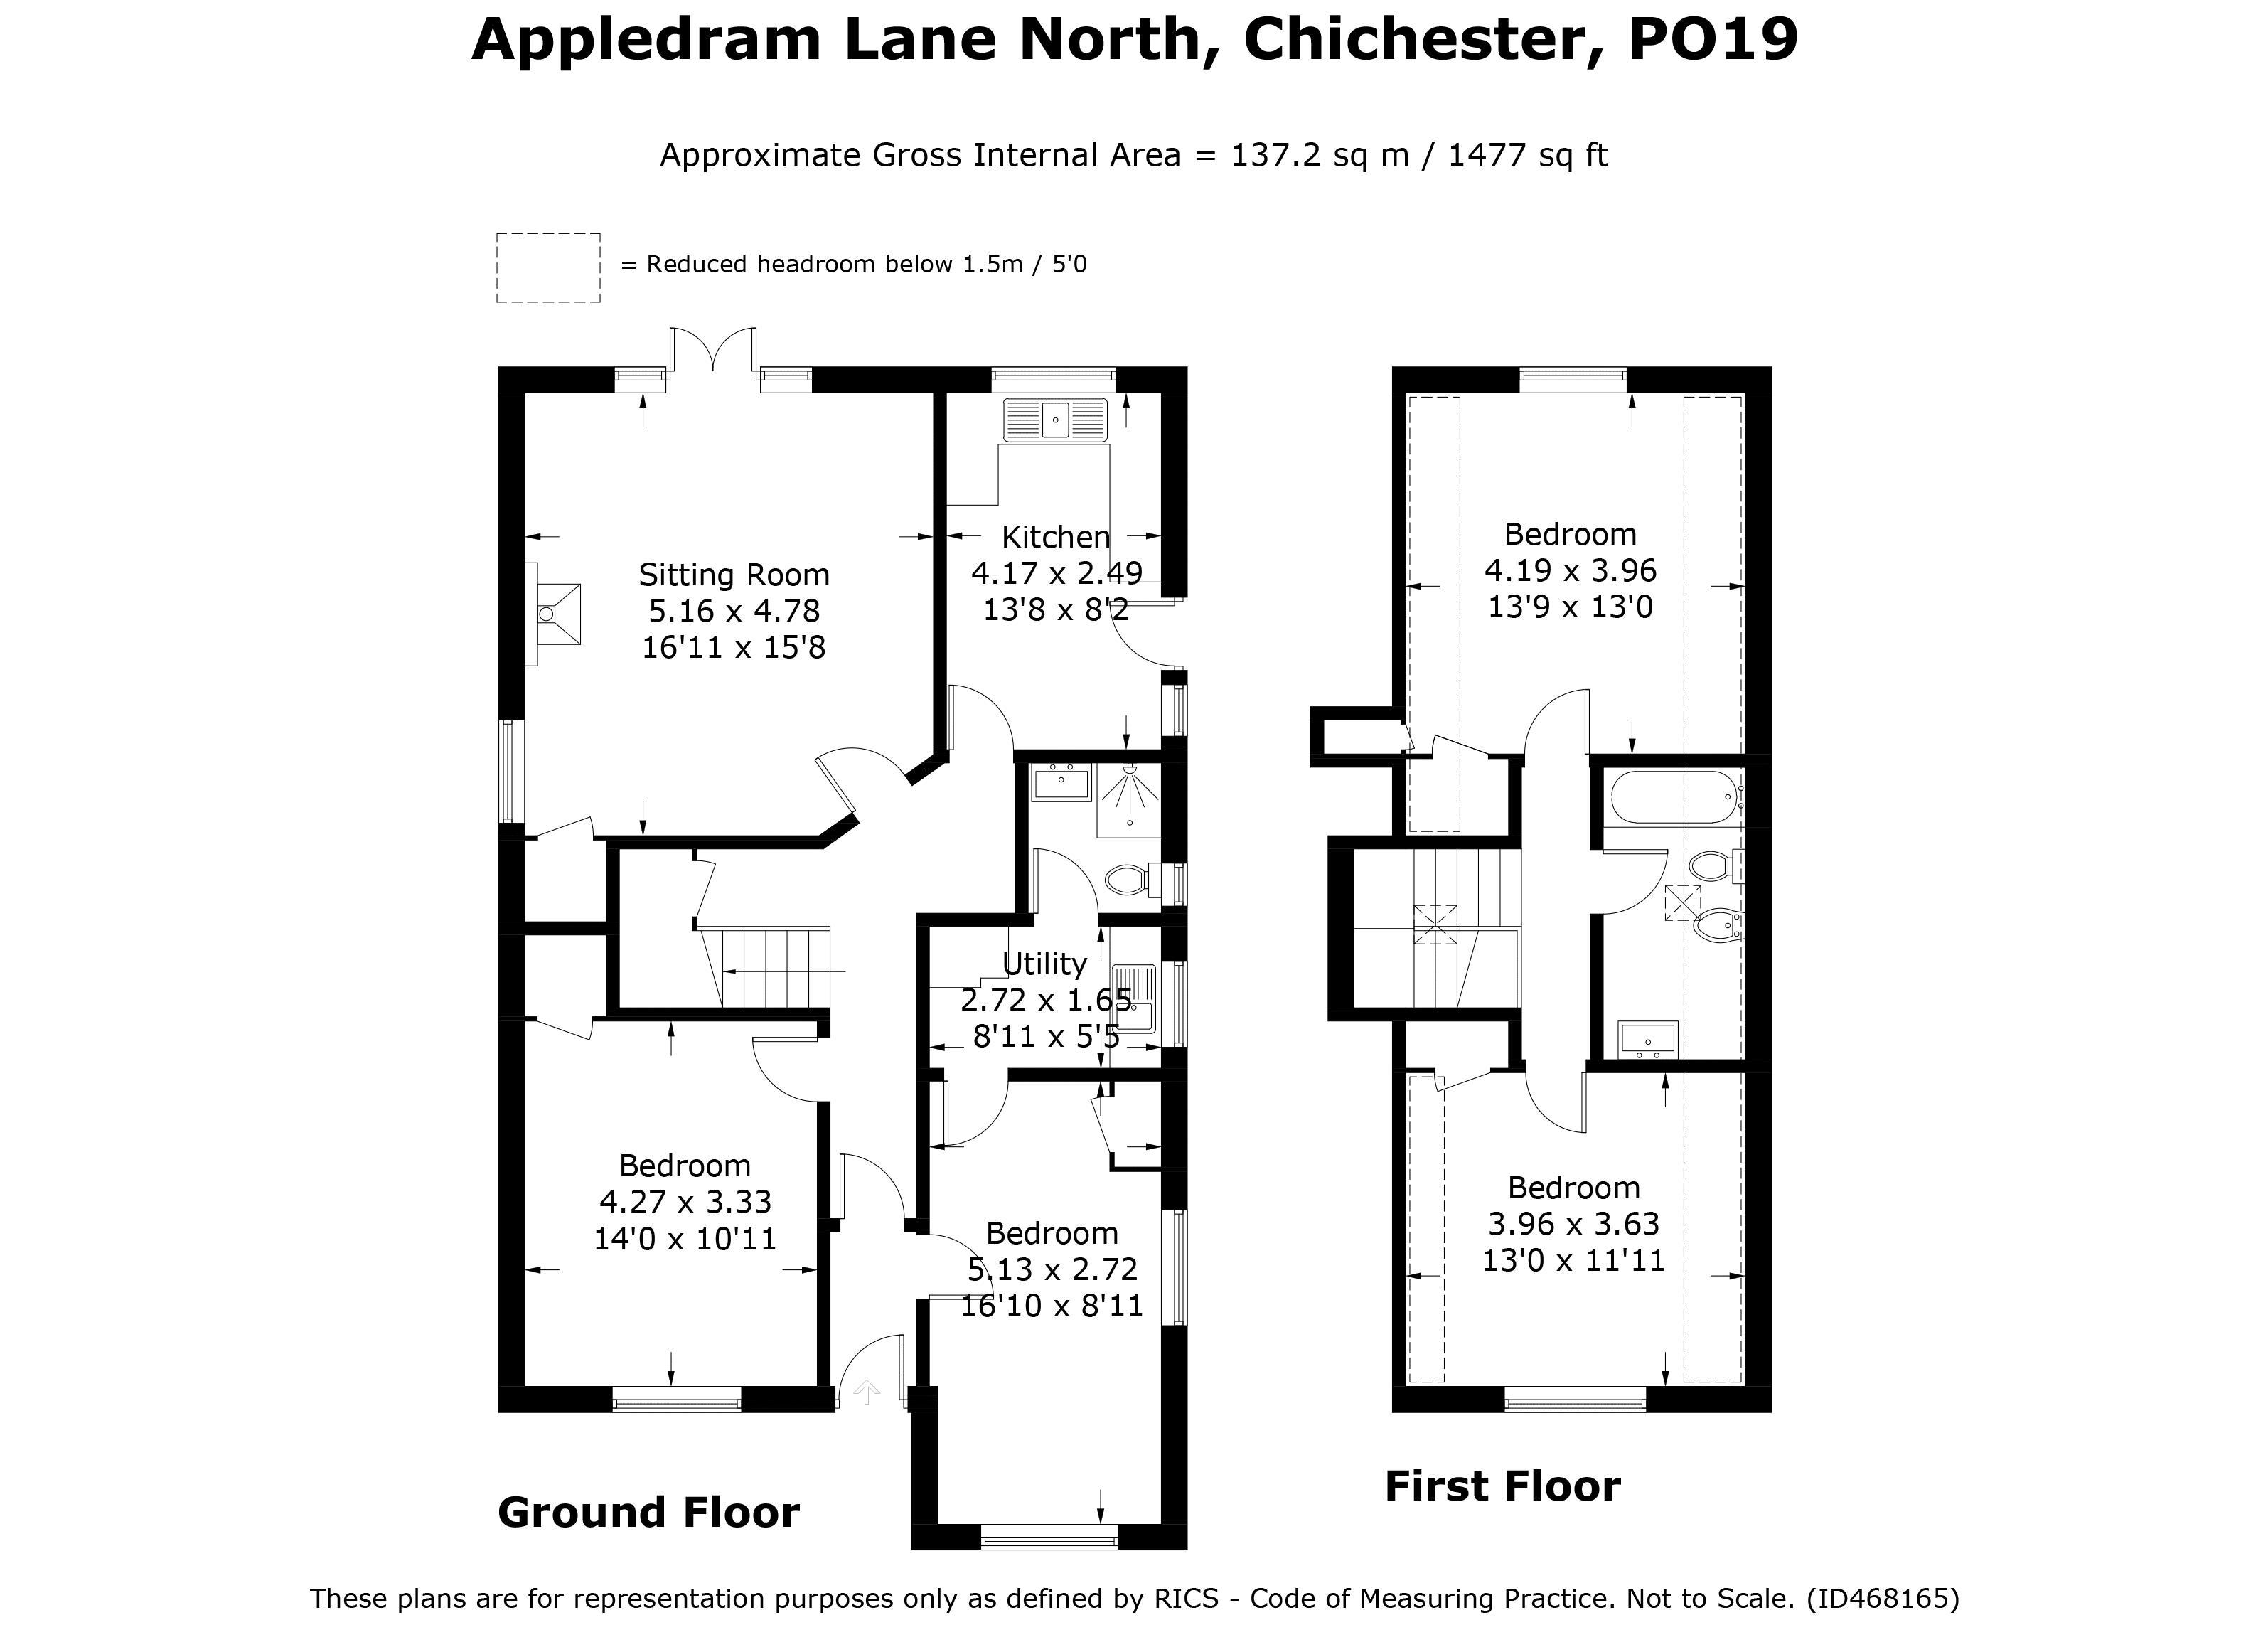 Appledram Lane North